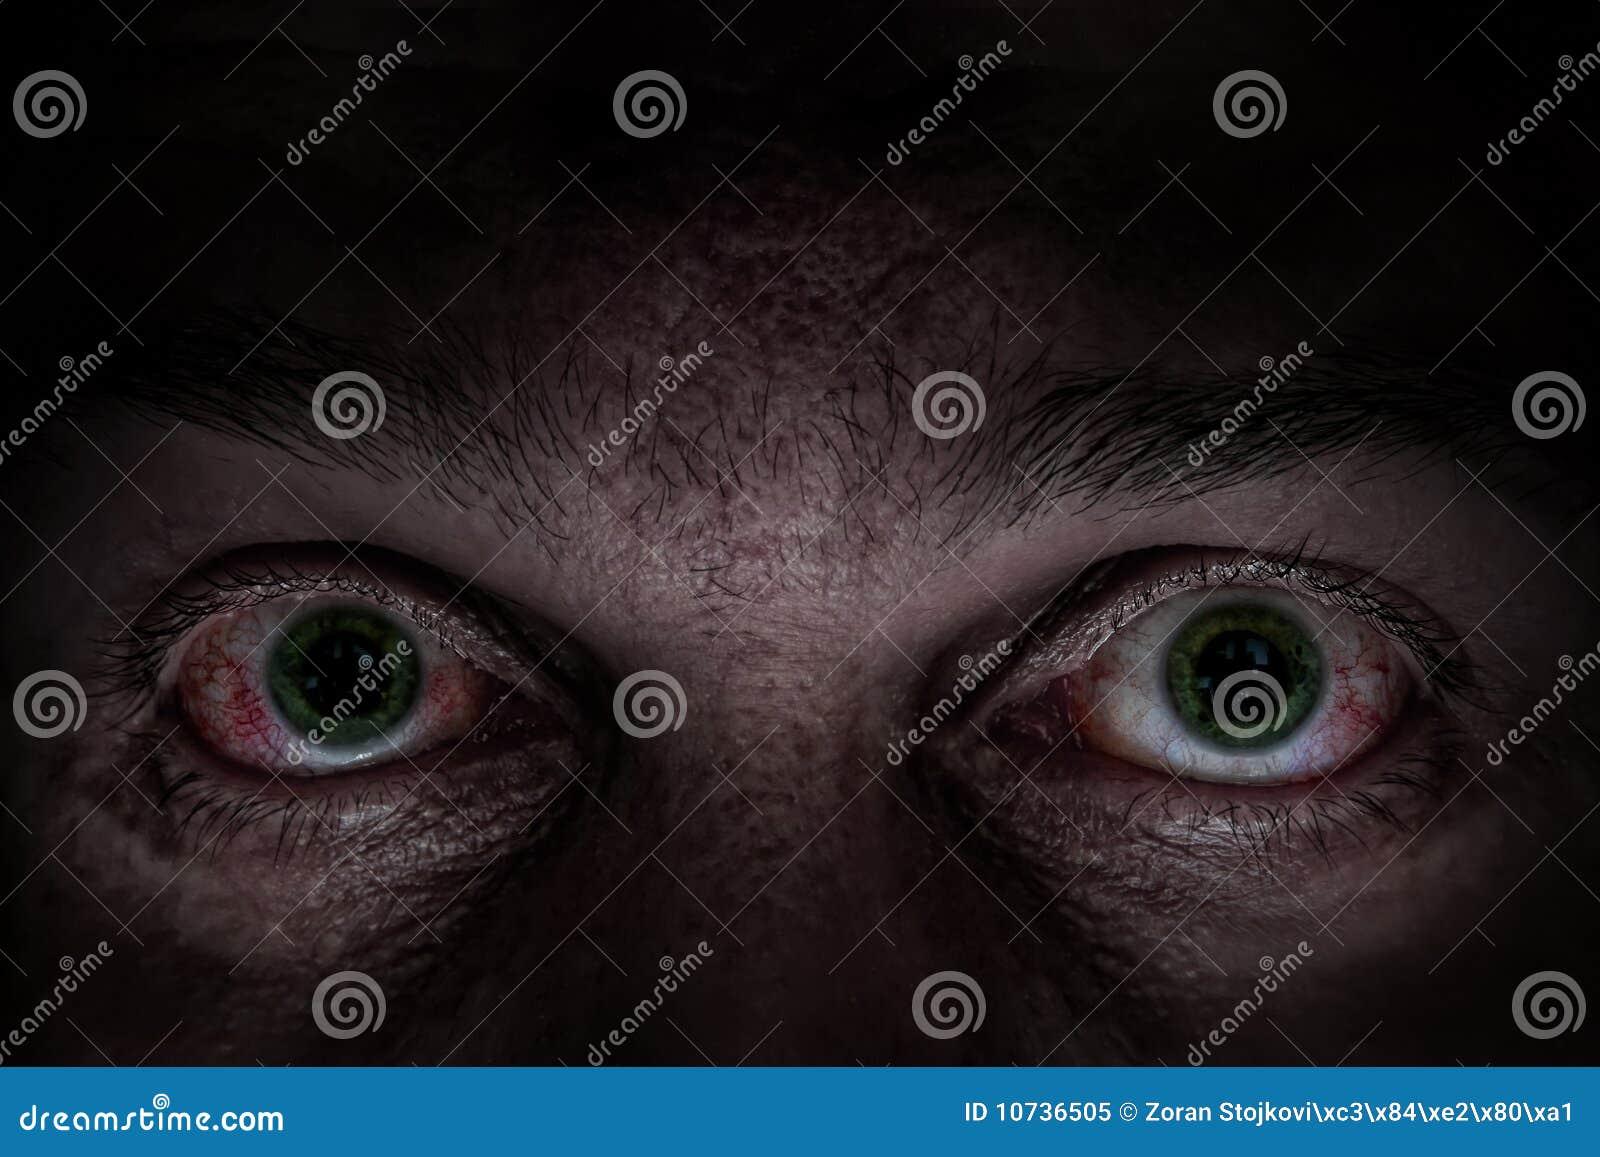 Ojos verdes asustadizos